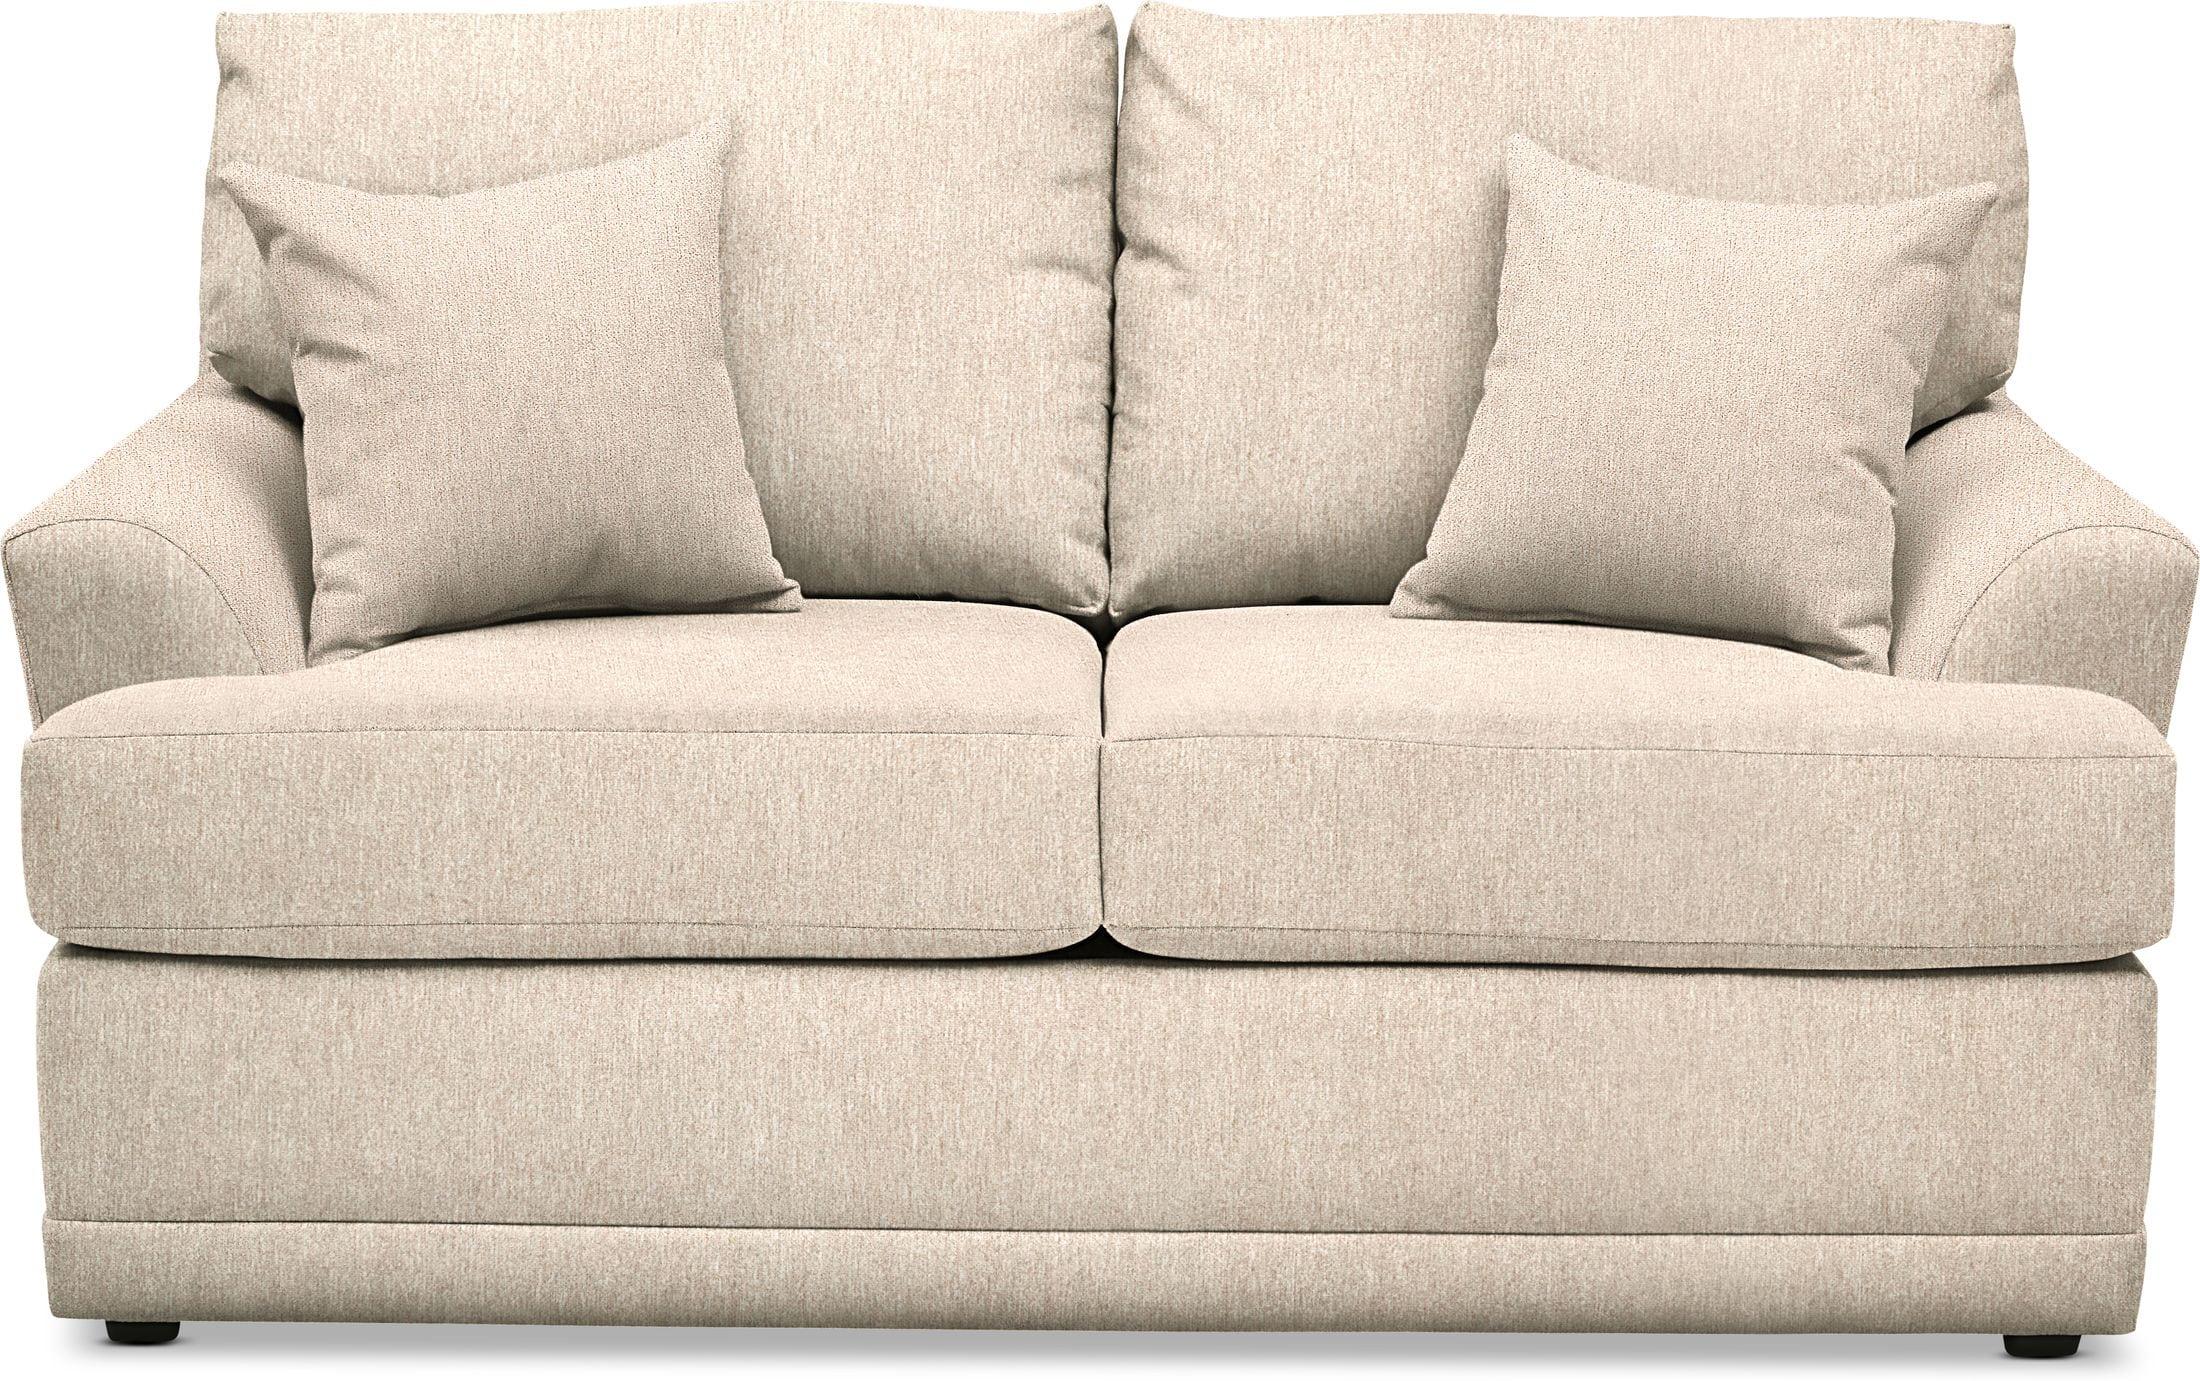 Living Room Furniture - Berkeley Performance Loveseat